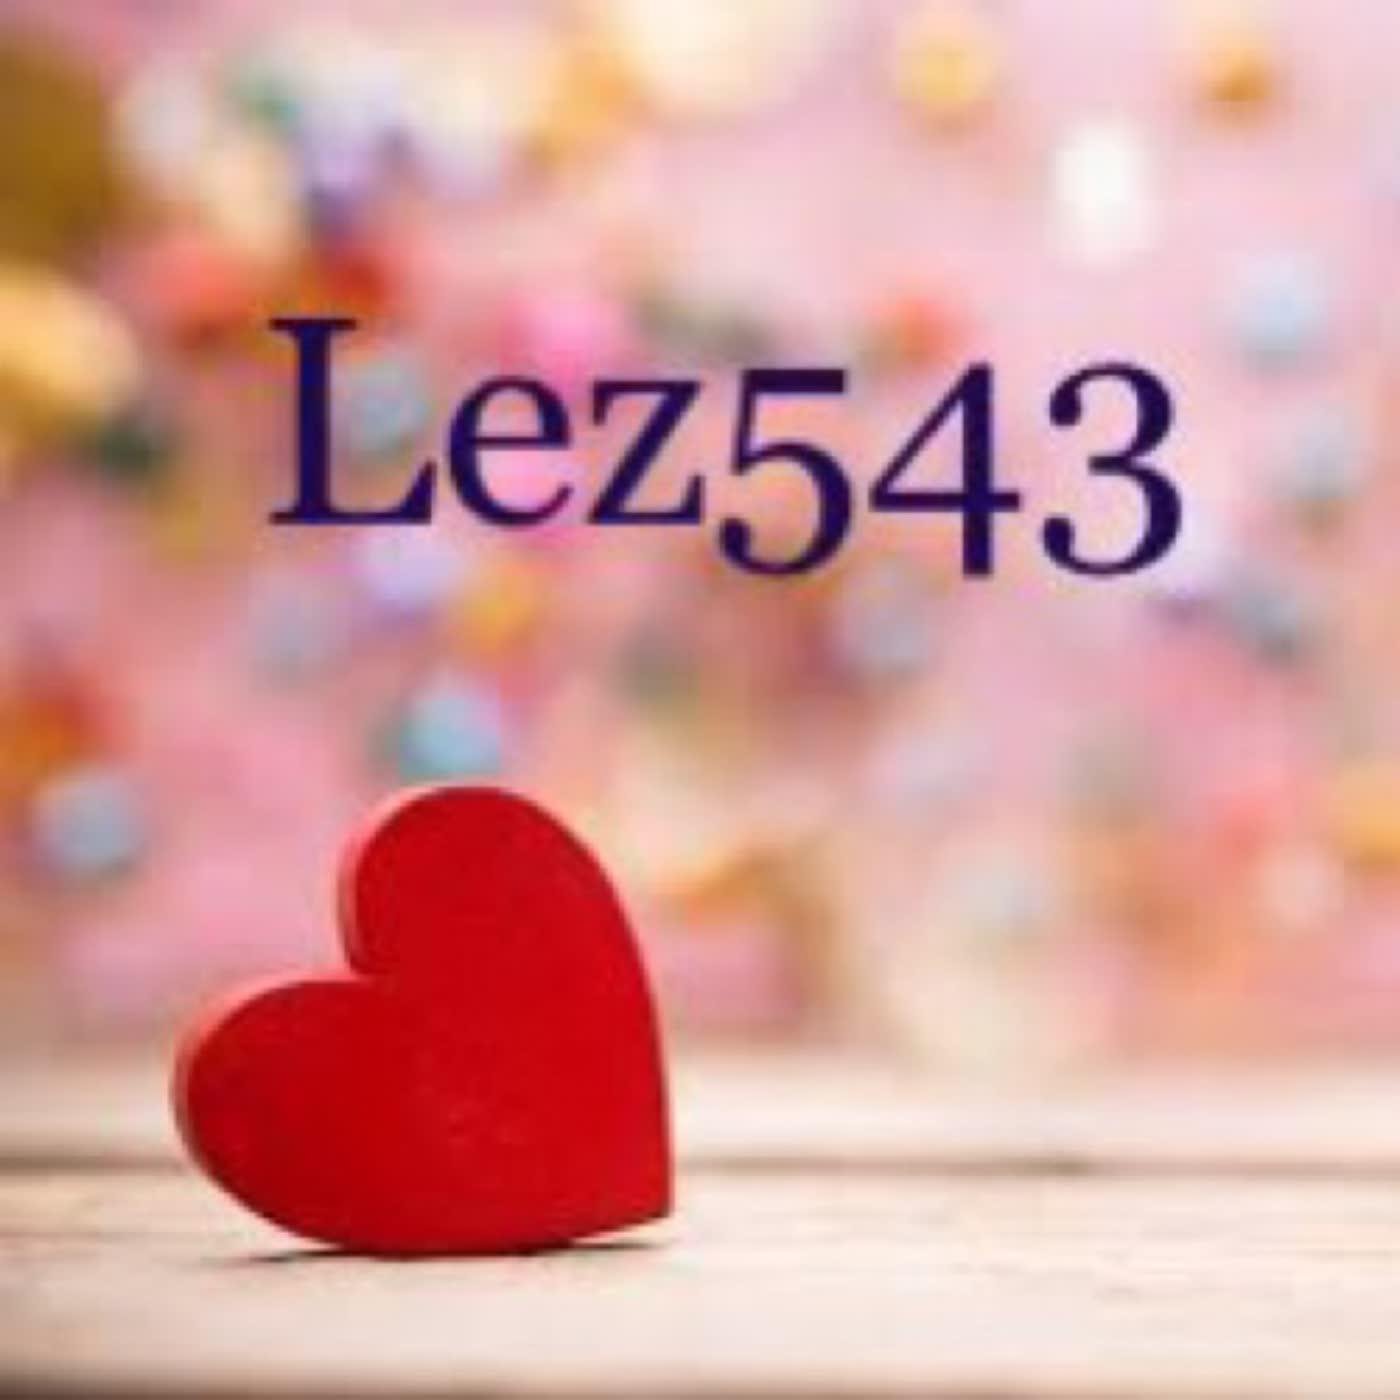 Lez543